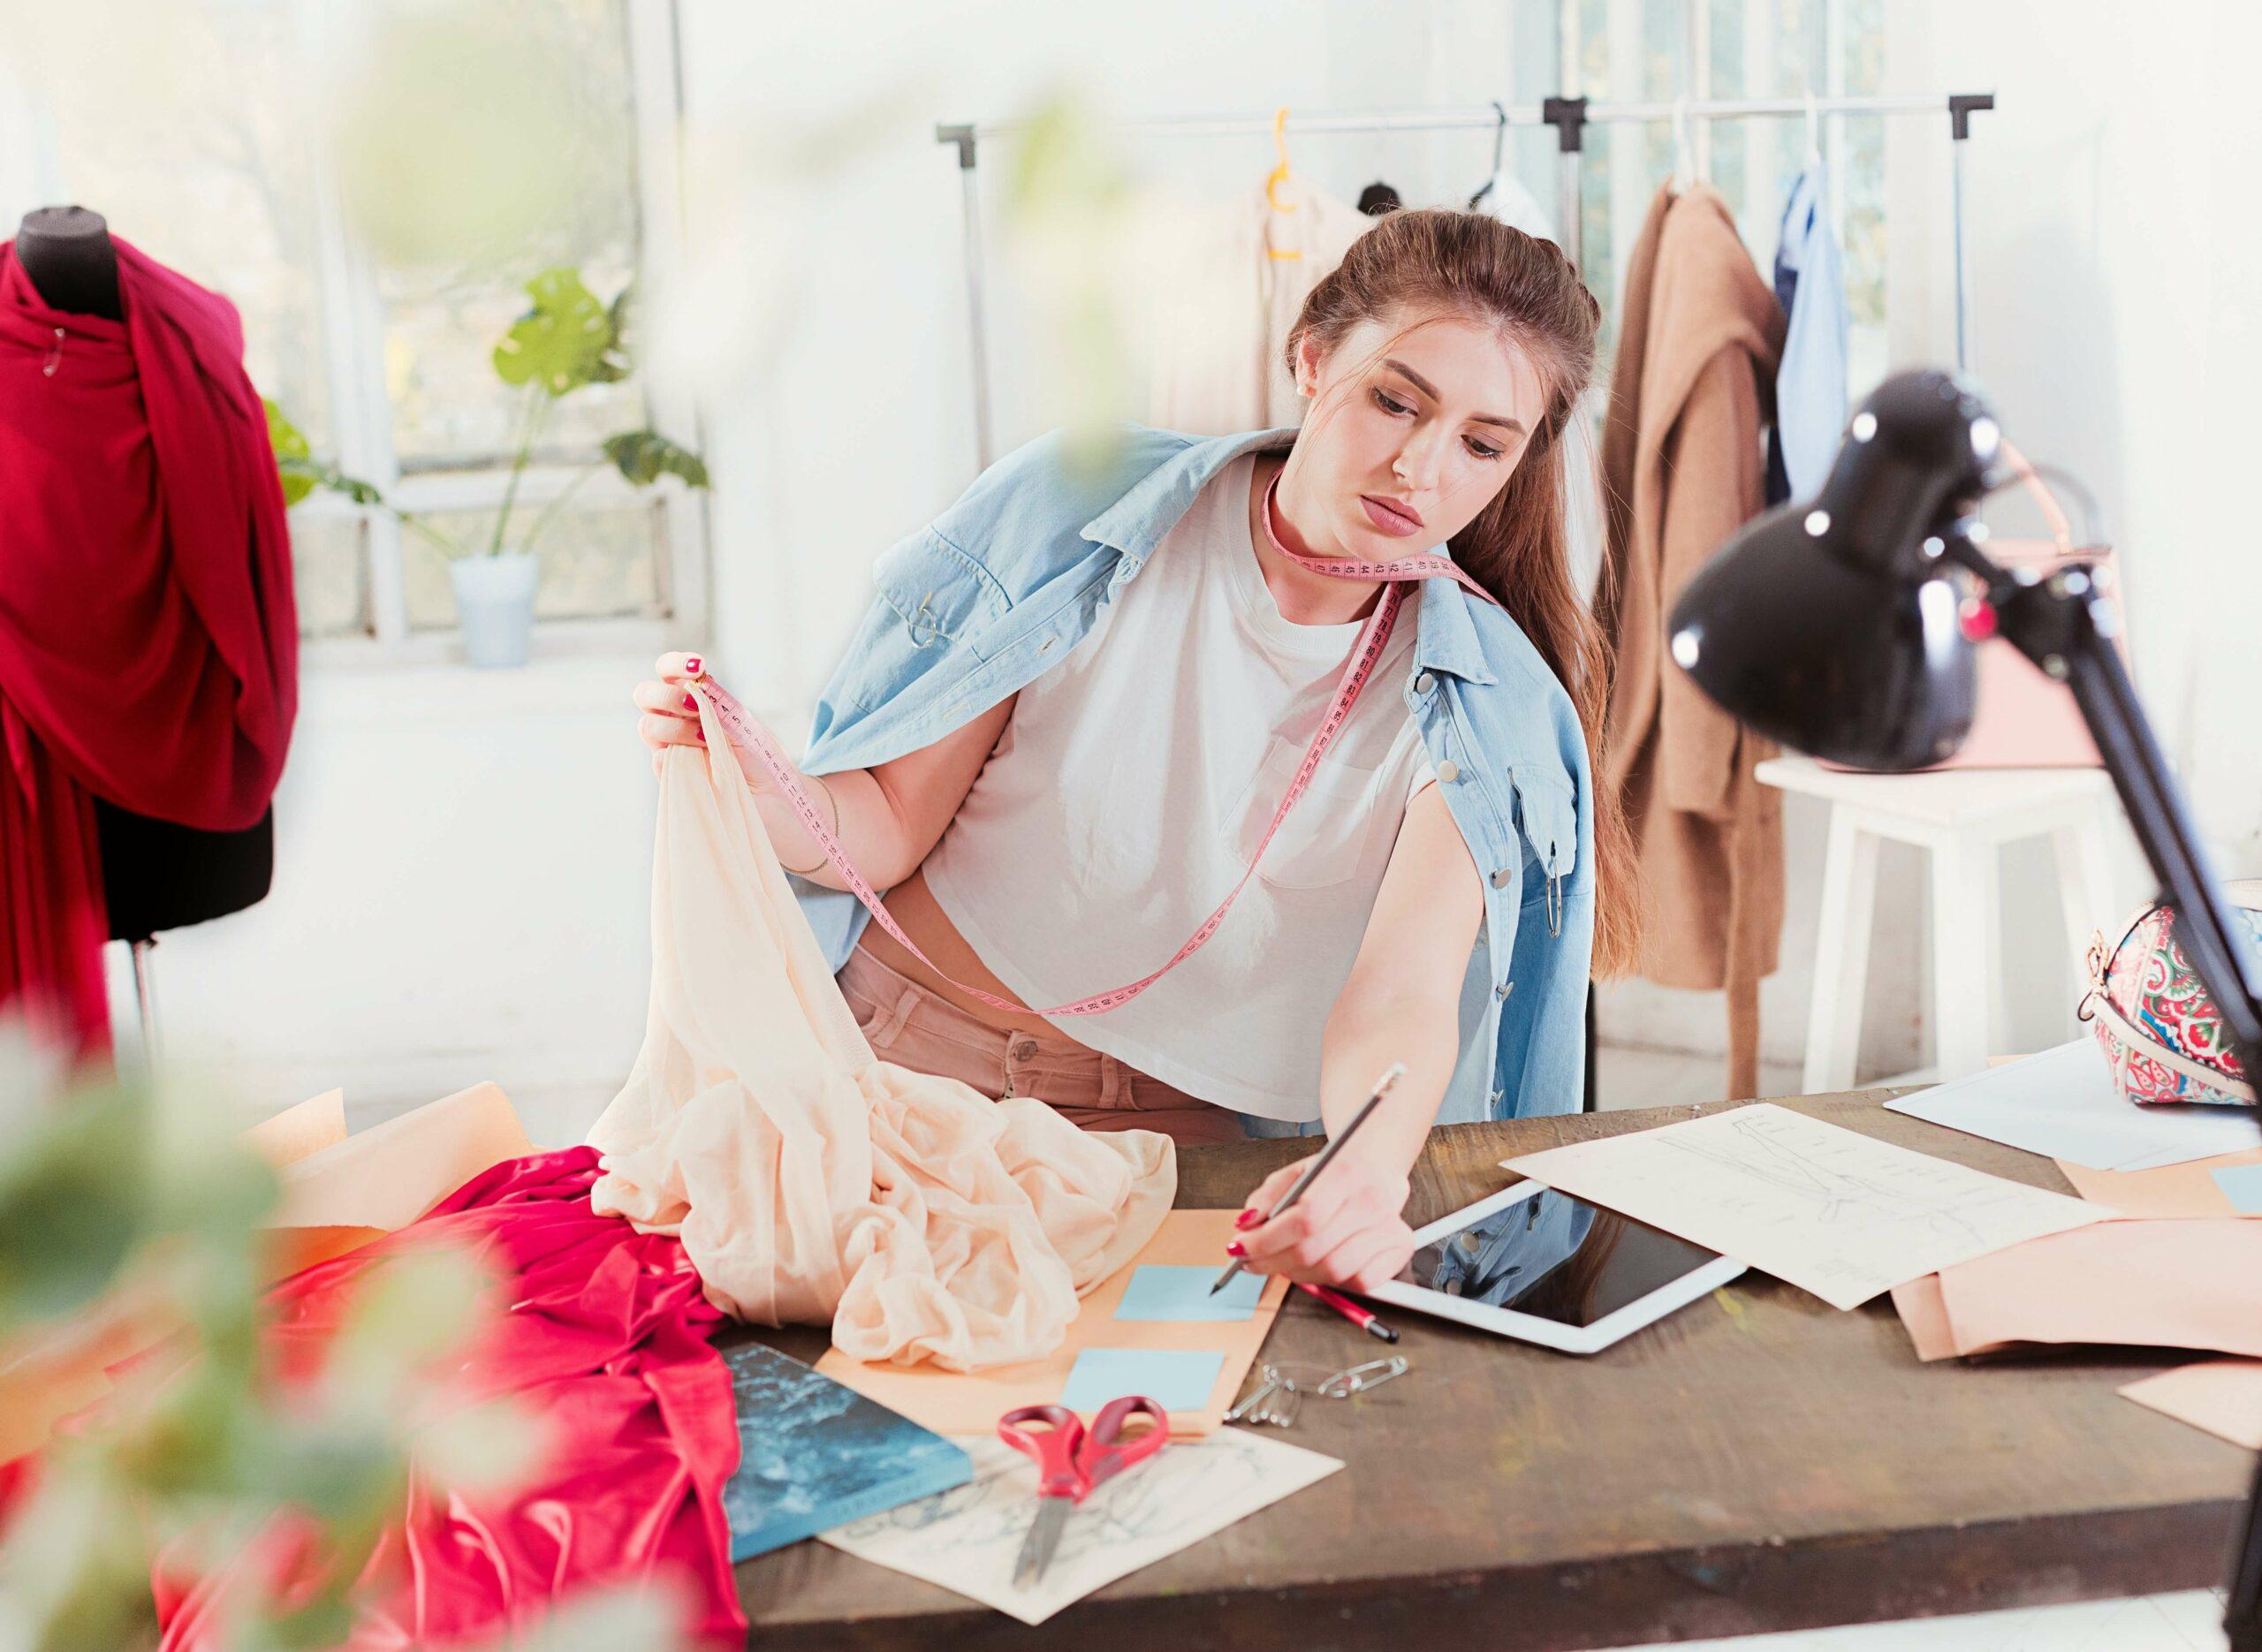 female fashion design student thinking working laptop bright studio environment 1 1 scaled